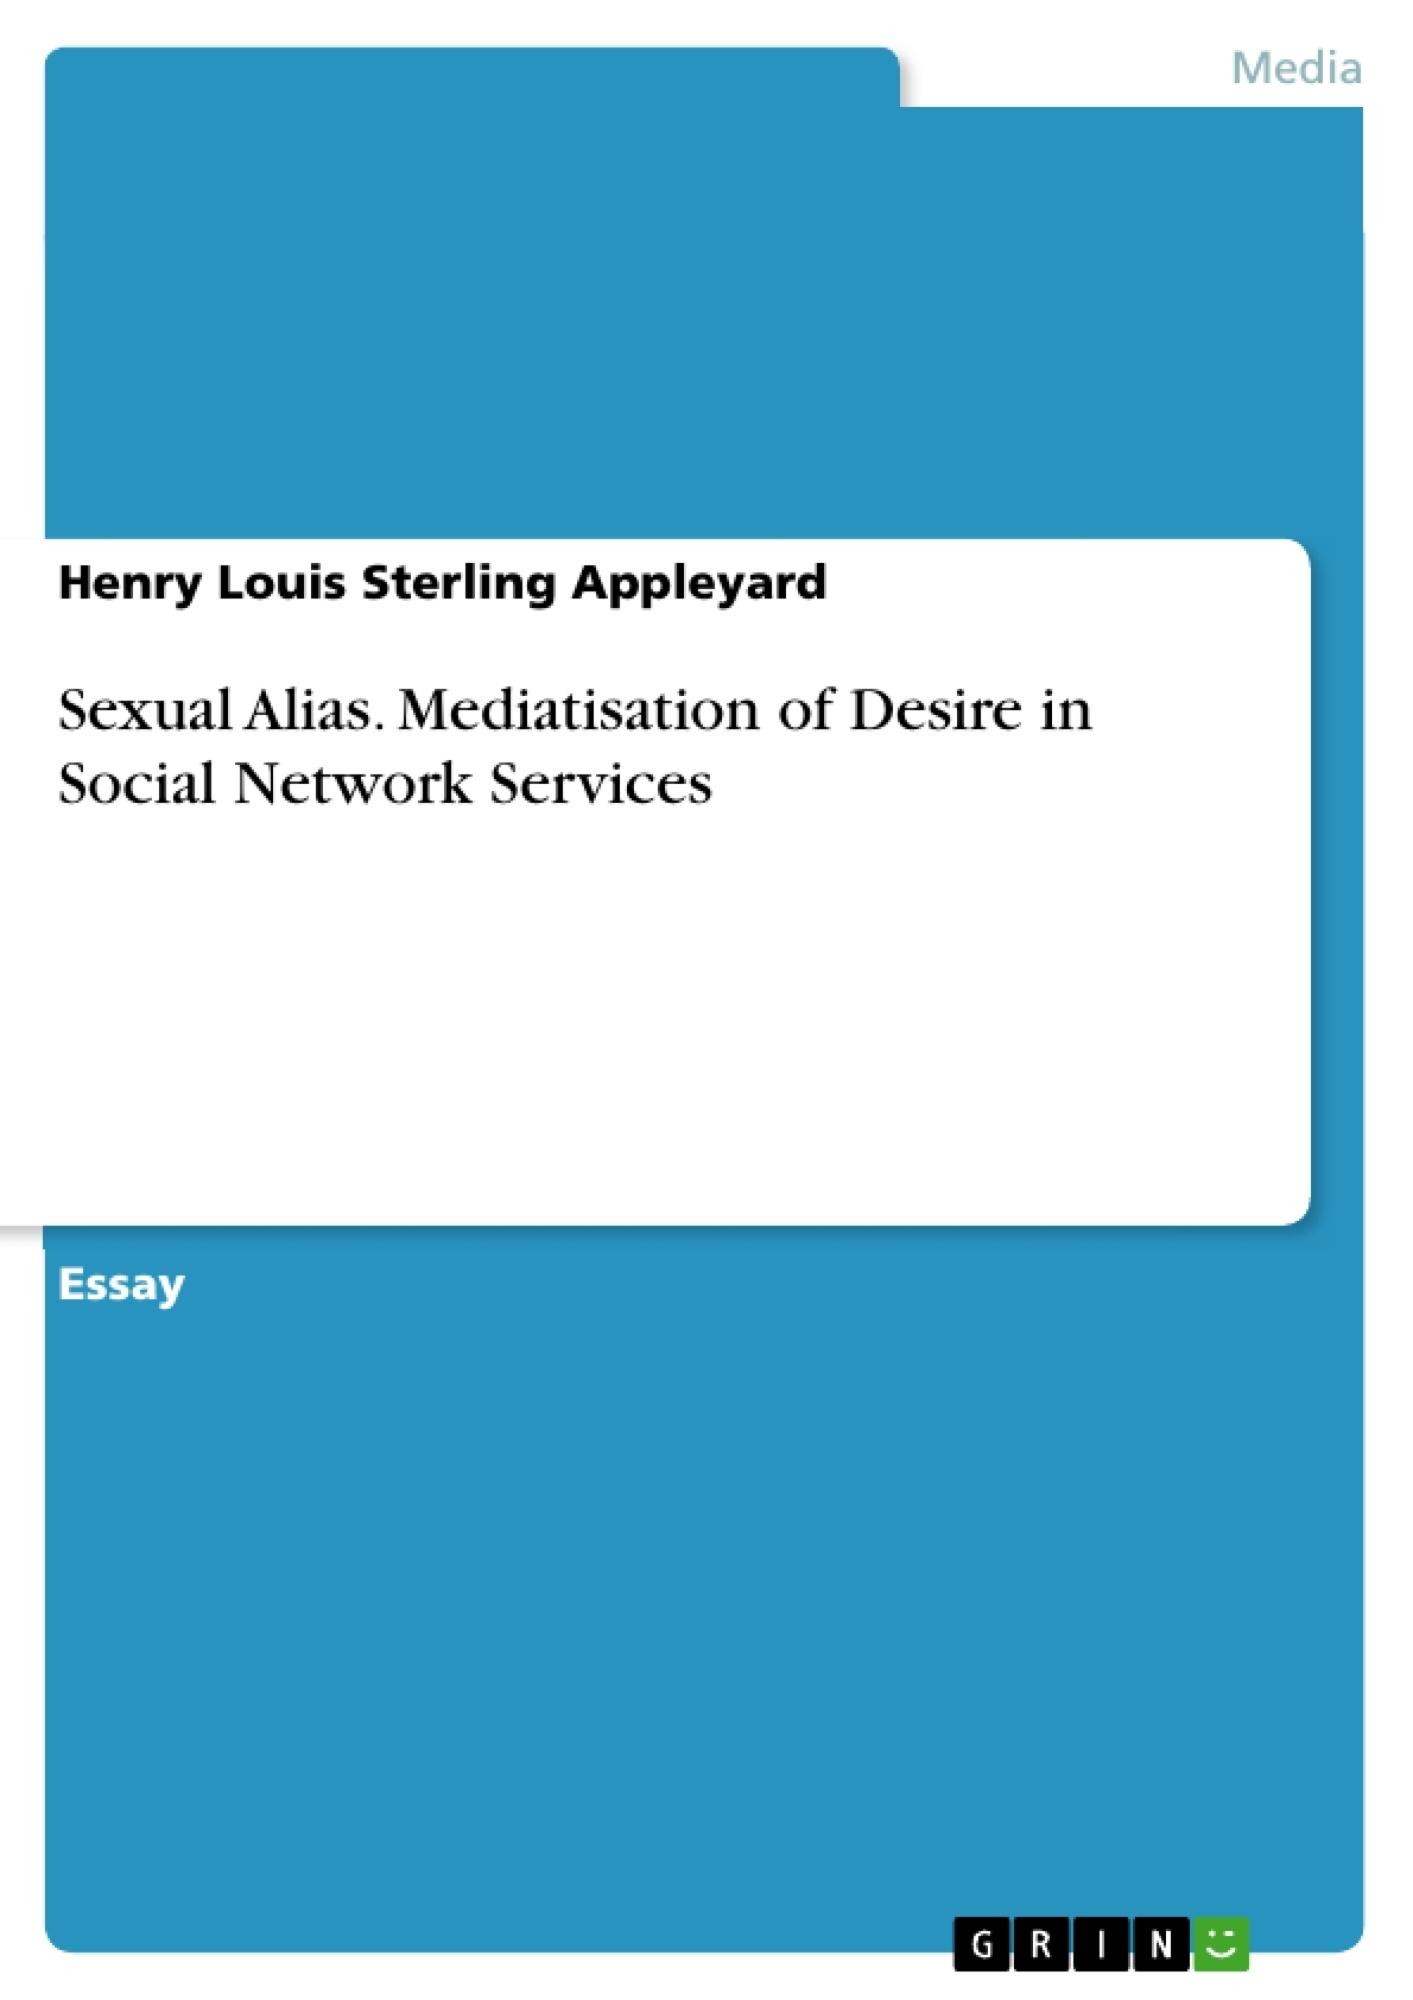 Title: Sexual Alias. Mediatisation of Desire in Social Network Services